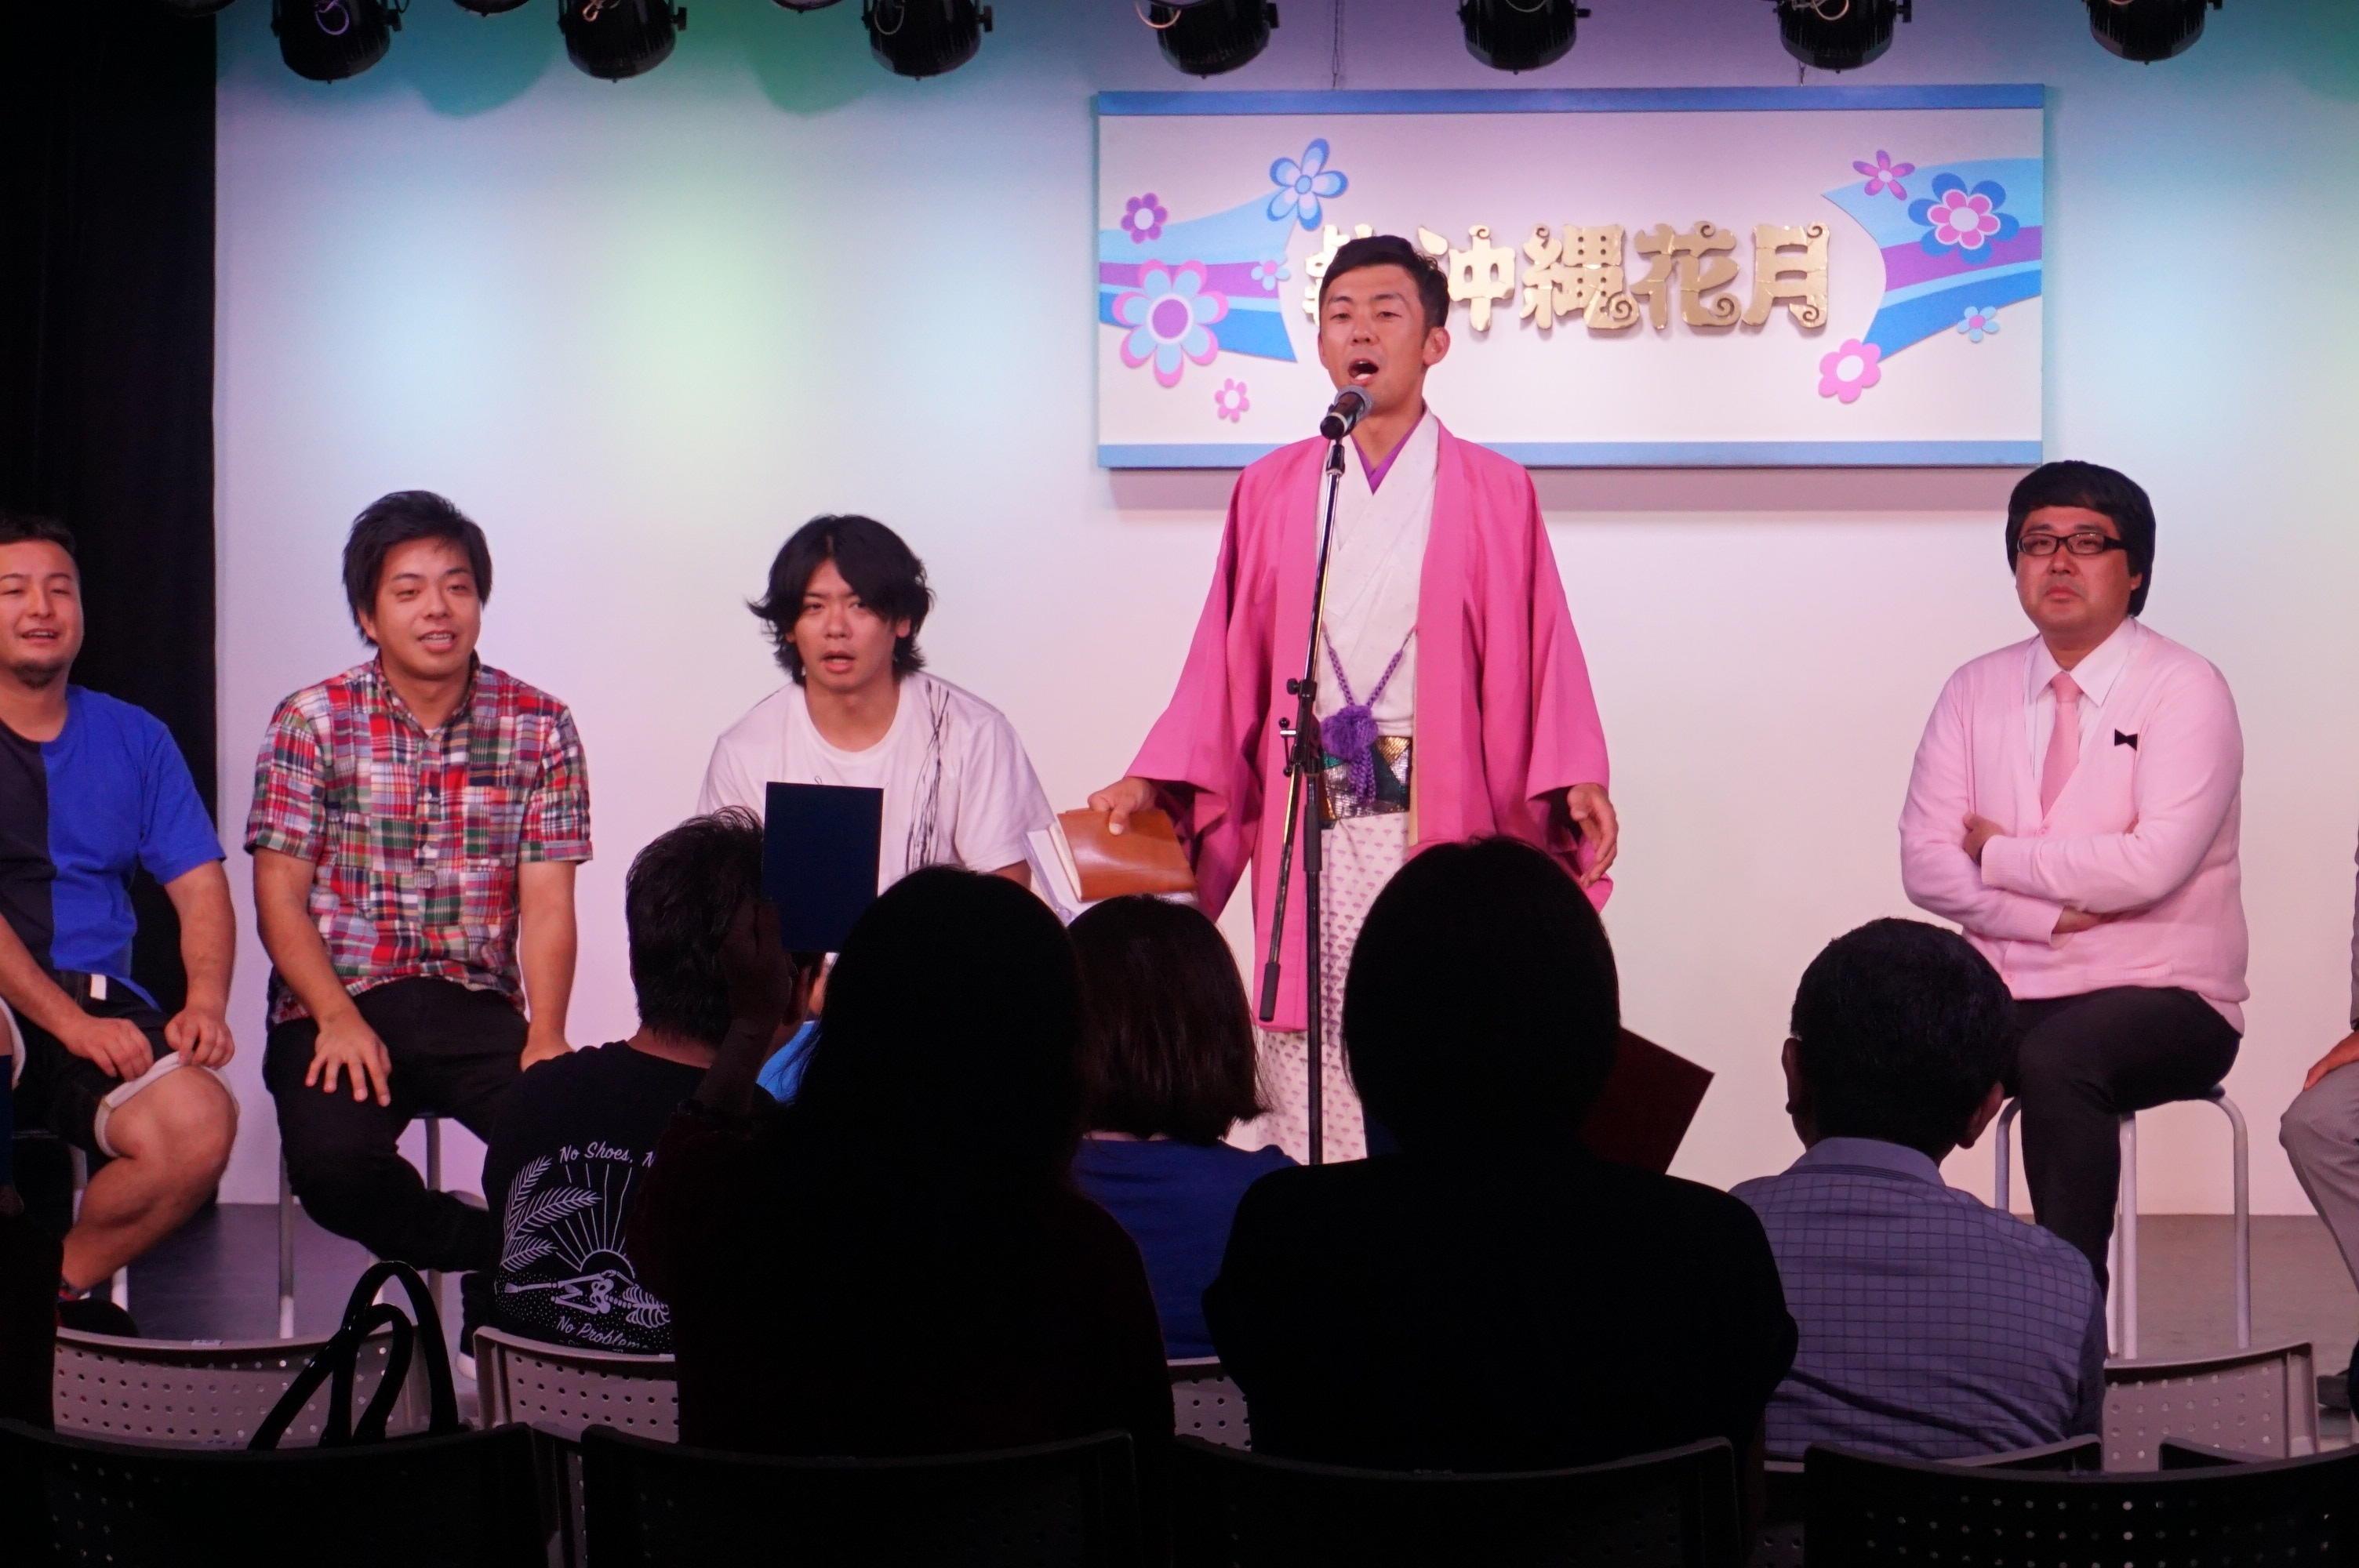 http://news.yoshimoto.co.jp/20180822203947-c5fd38232ac6ccffe43406156edd3f67e011dcd4.jpg